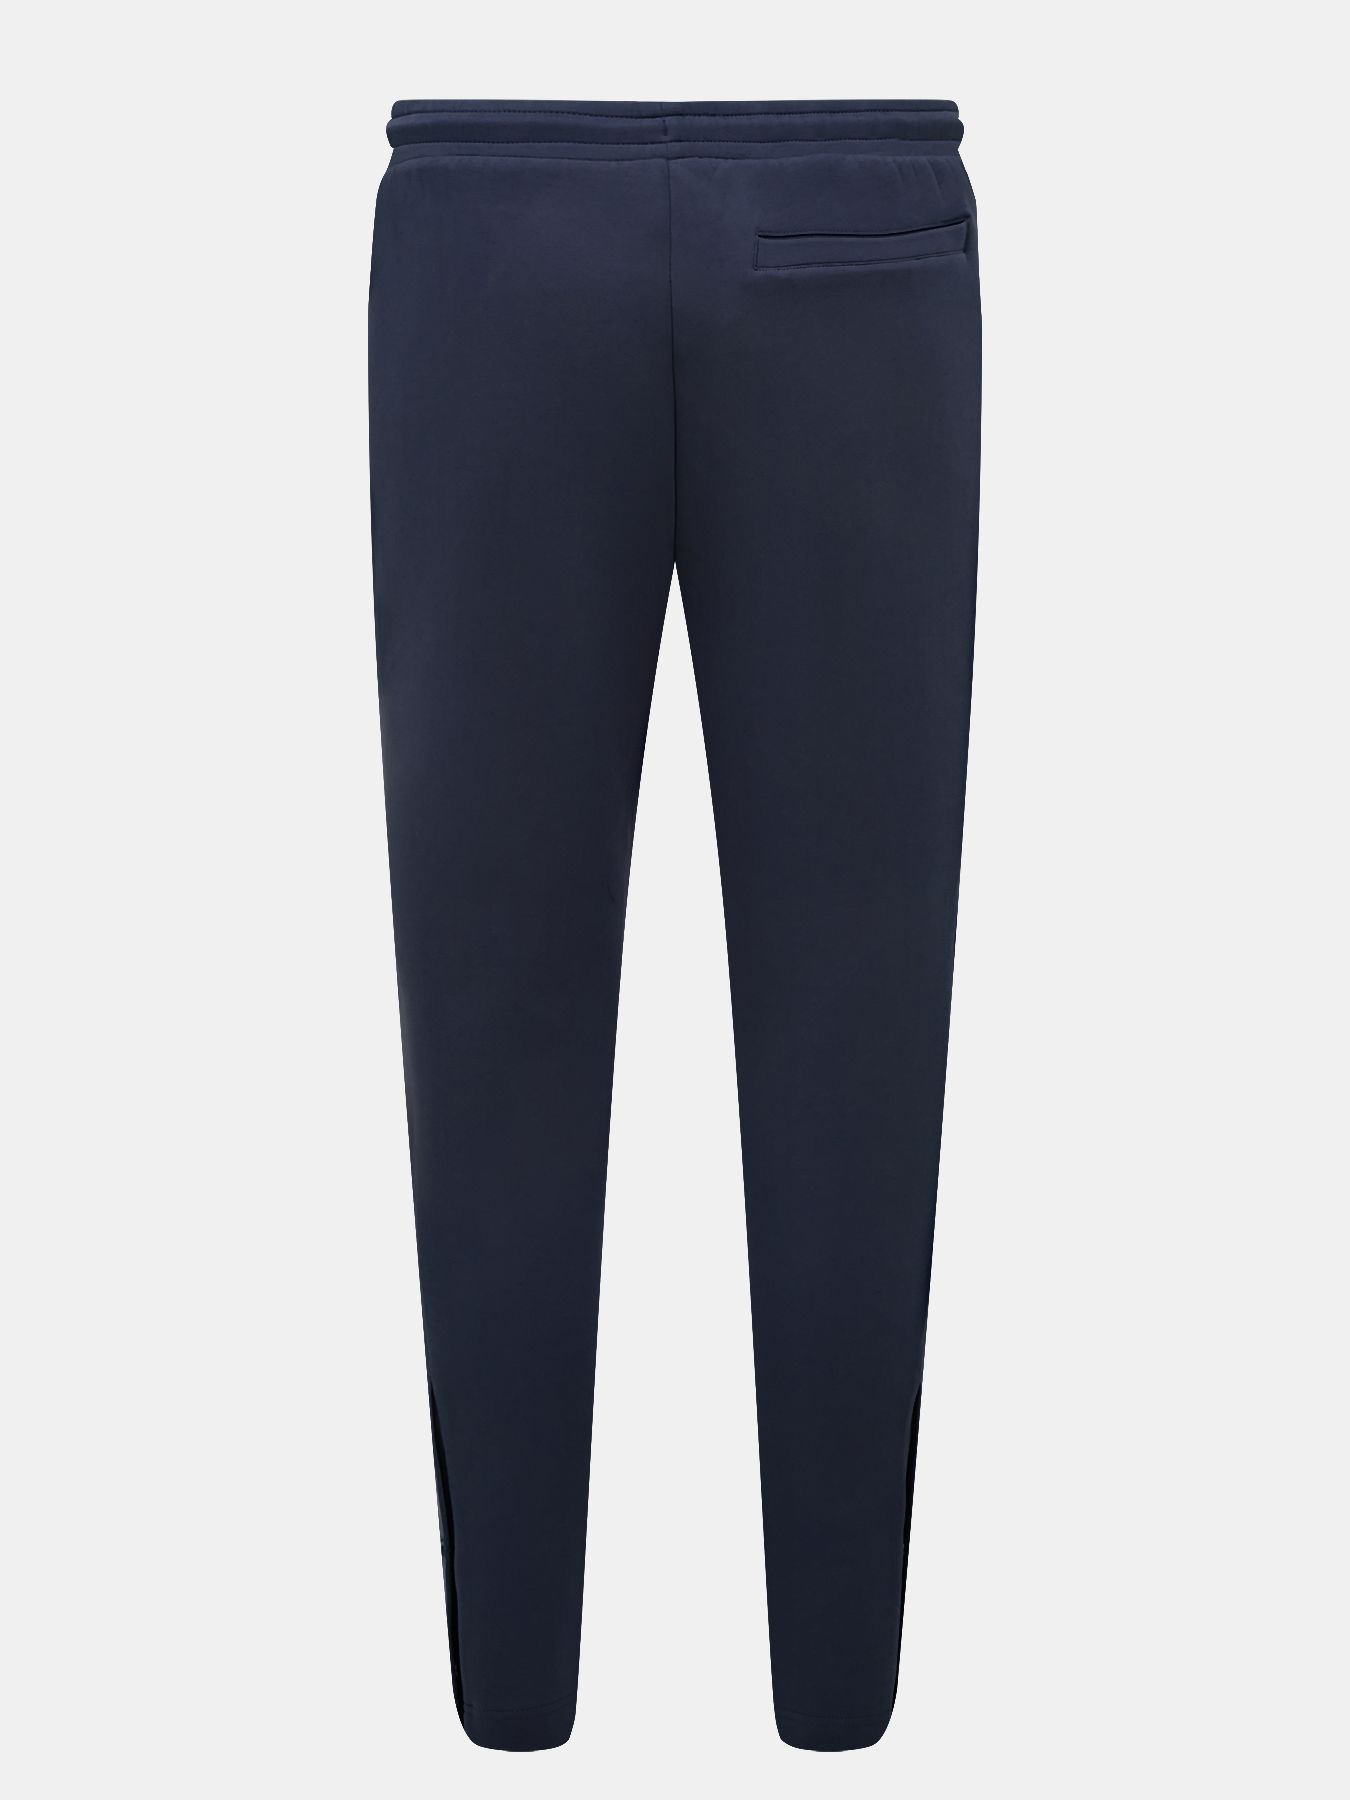 Брюки BOSS Спортивные брюки Hurley брюки спортивные columbia columbia anytime outdoor boot cut pant